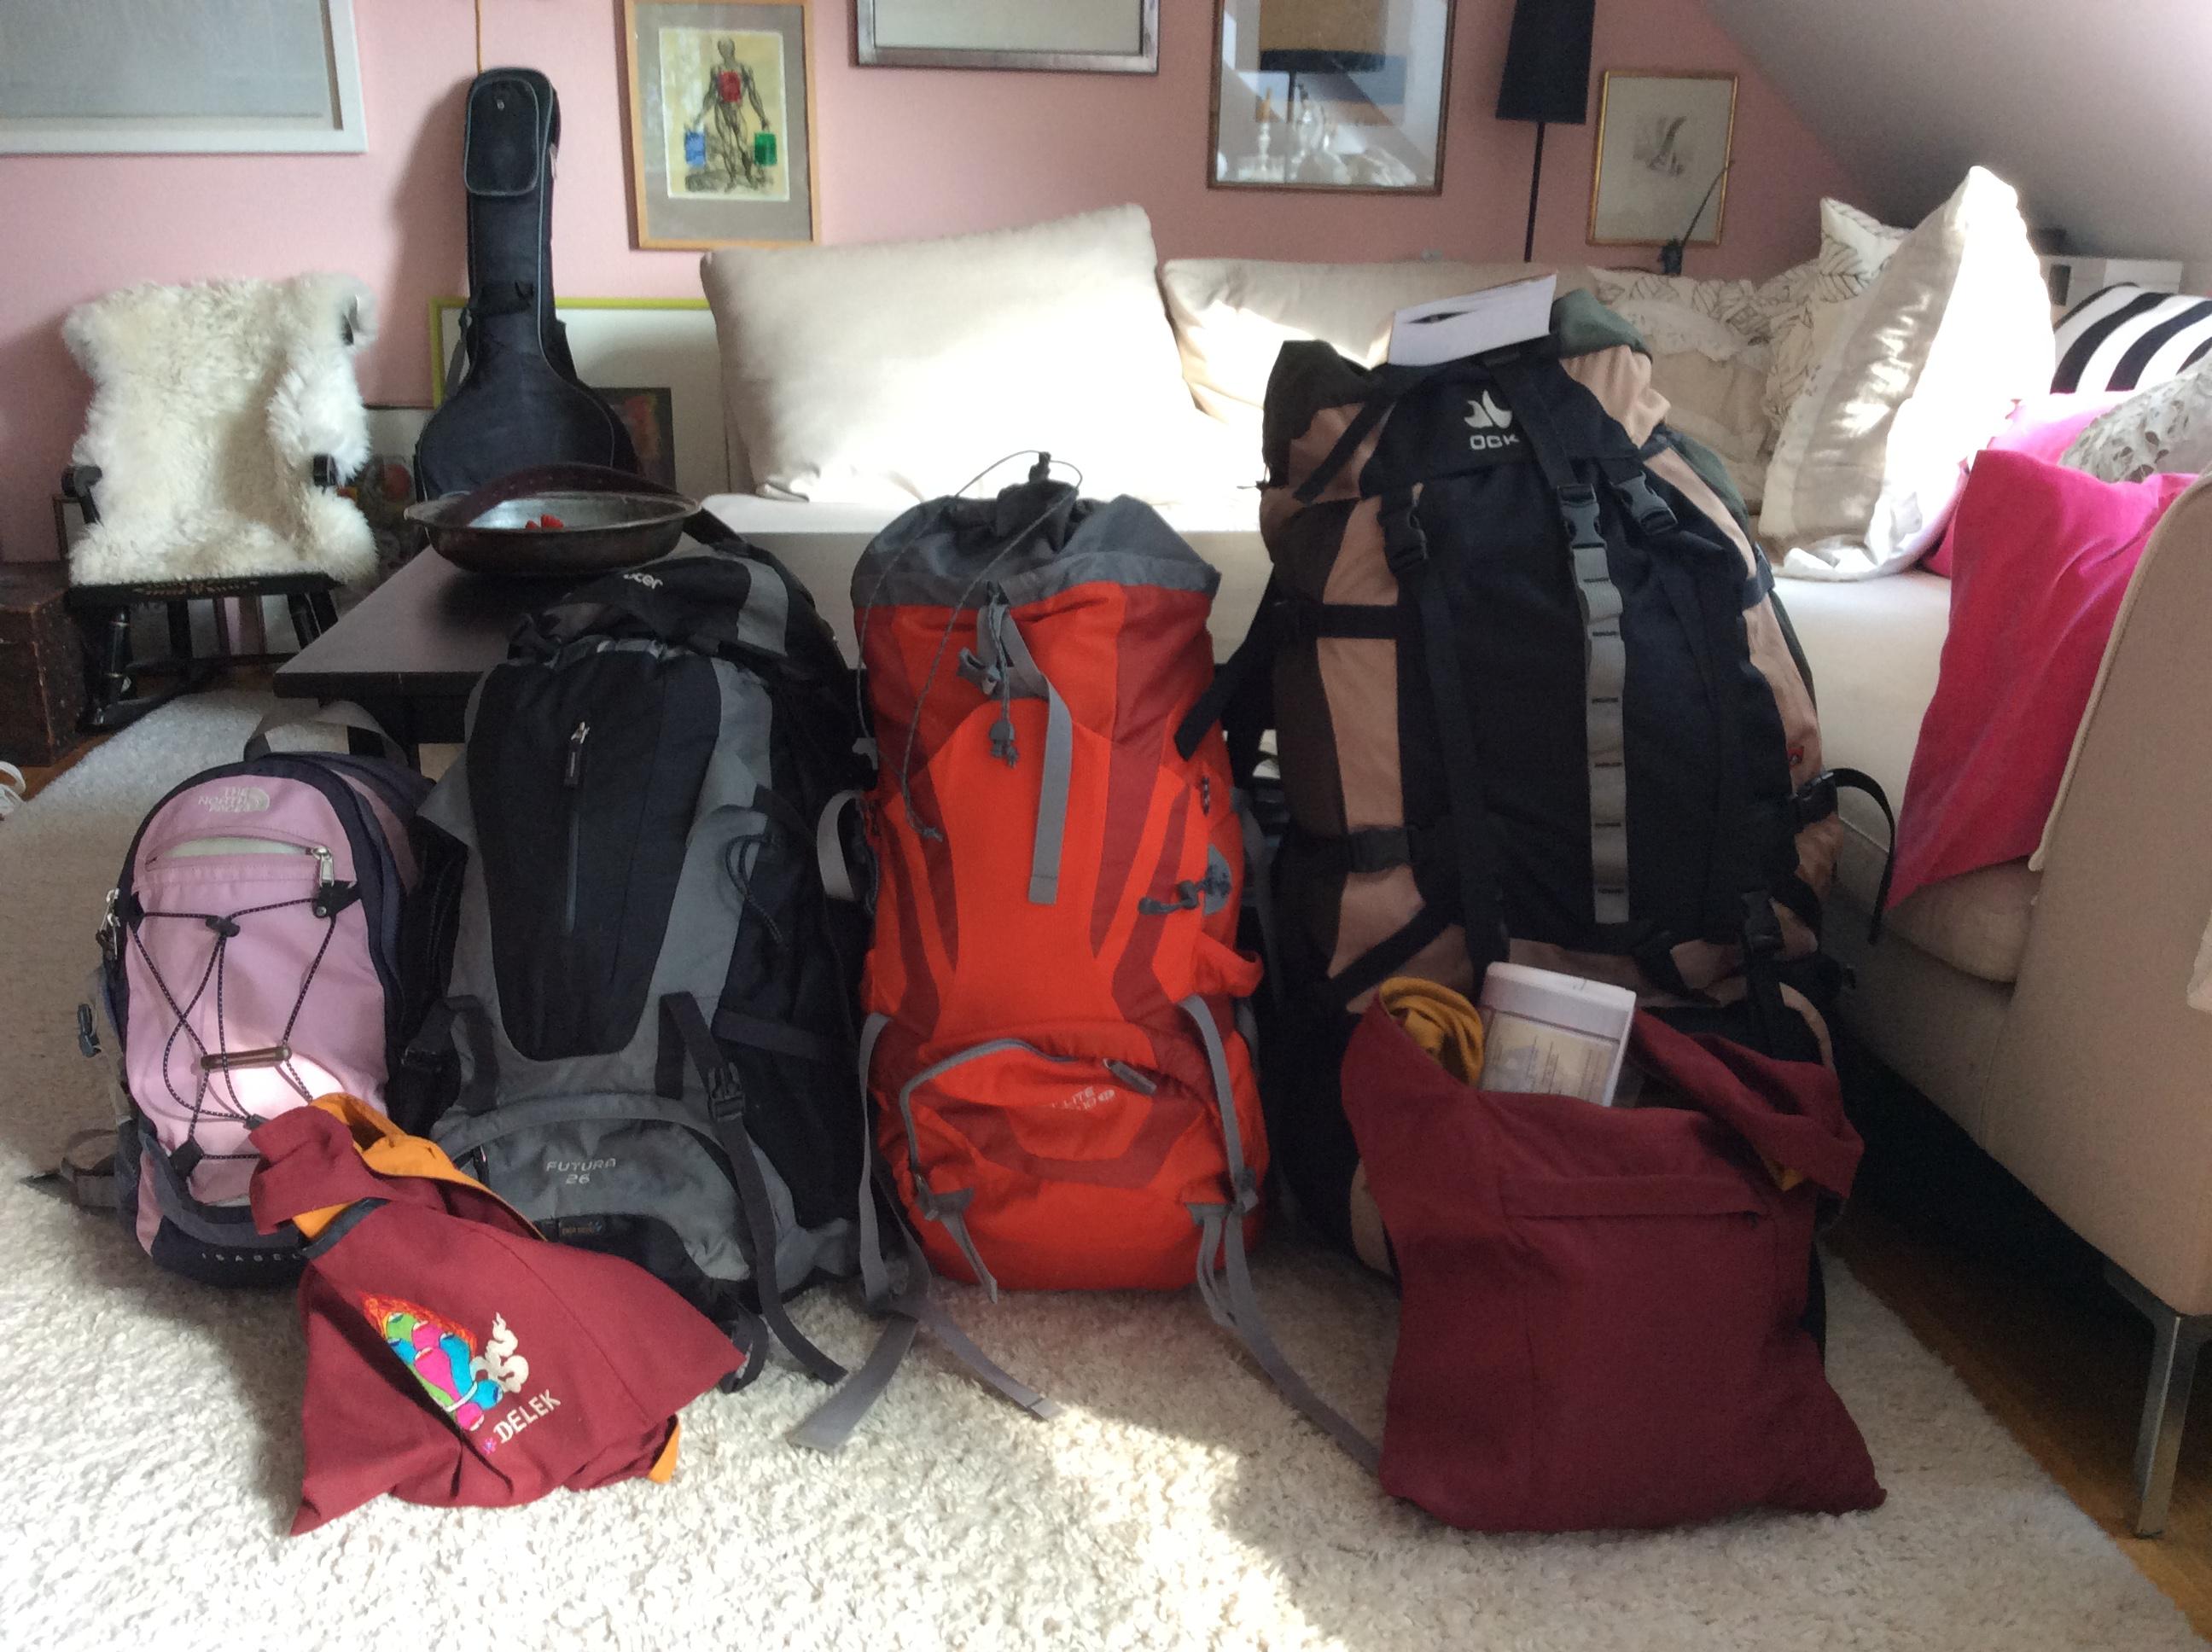 Nur 28 kg Gepäck! Cool!